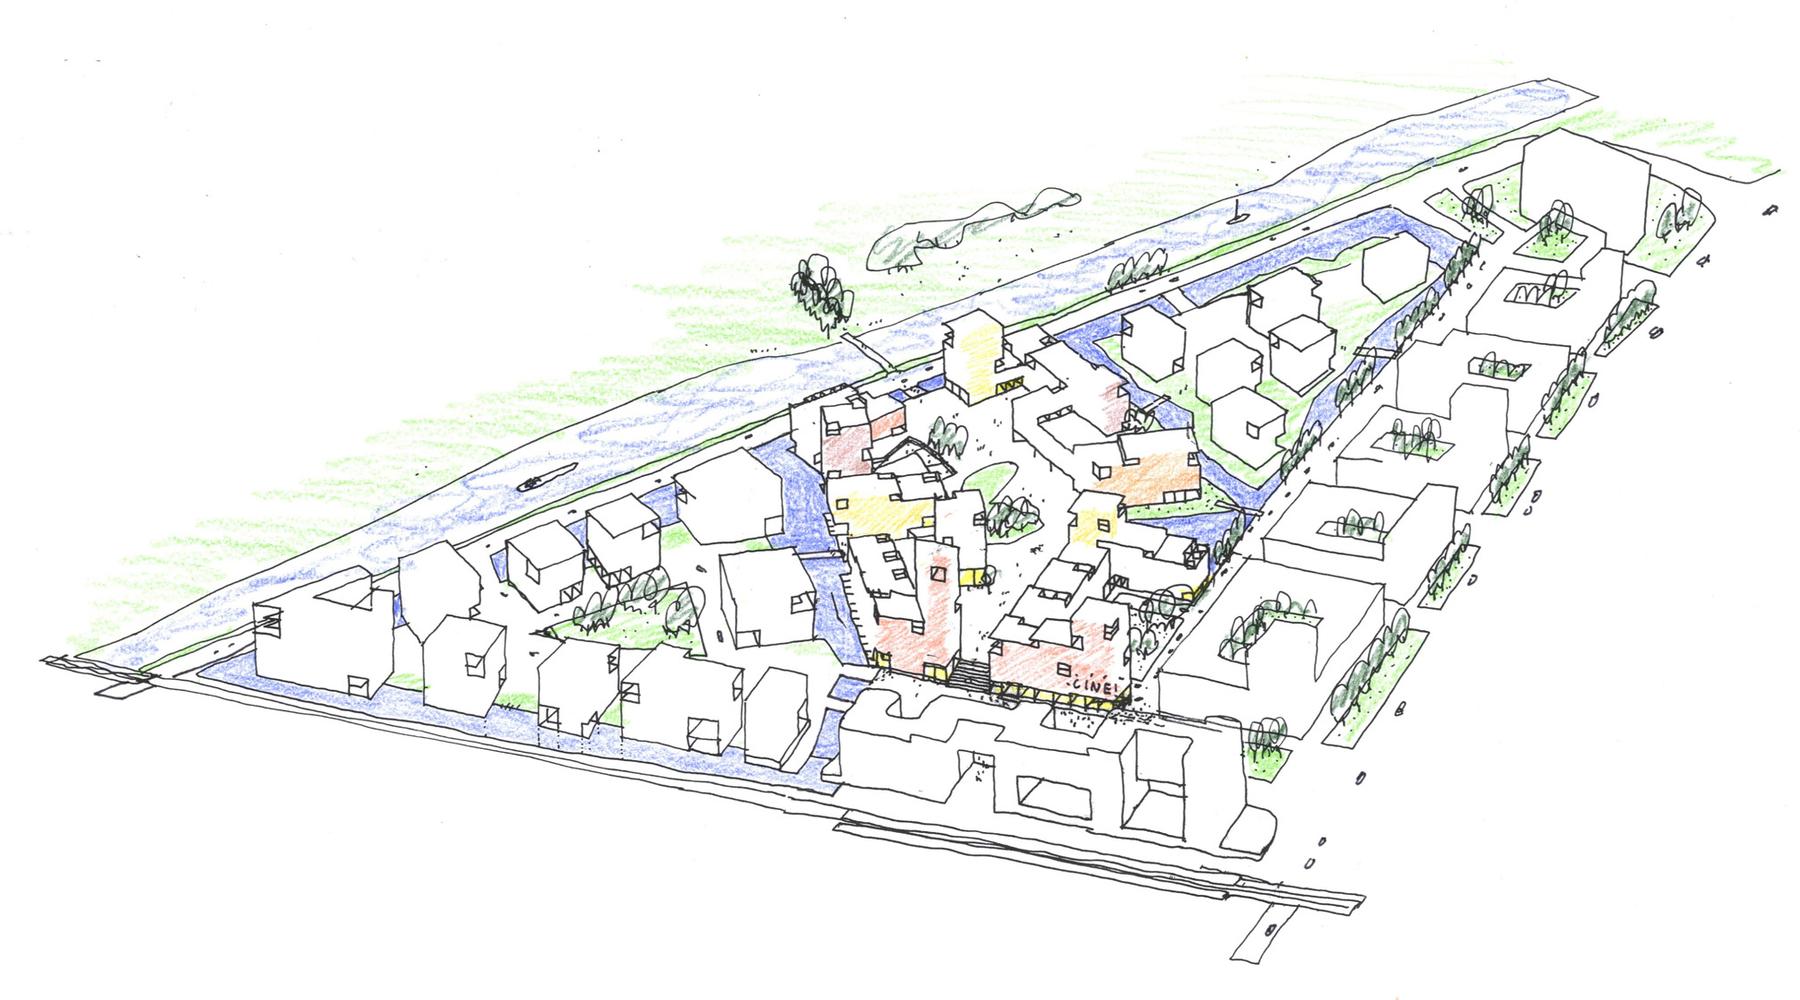 morfis-urbanism-leiden06